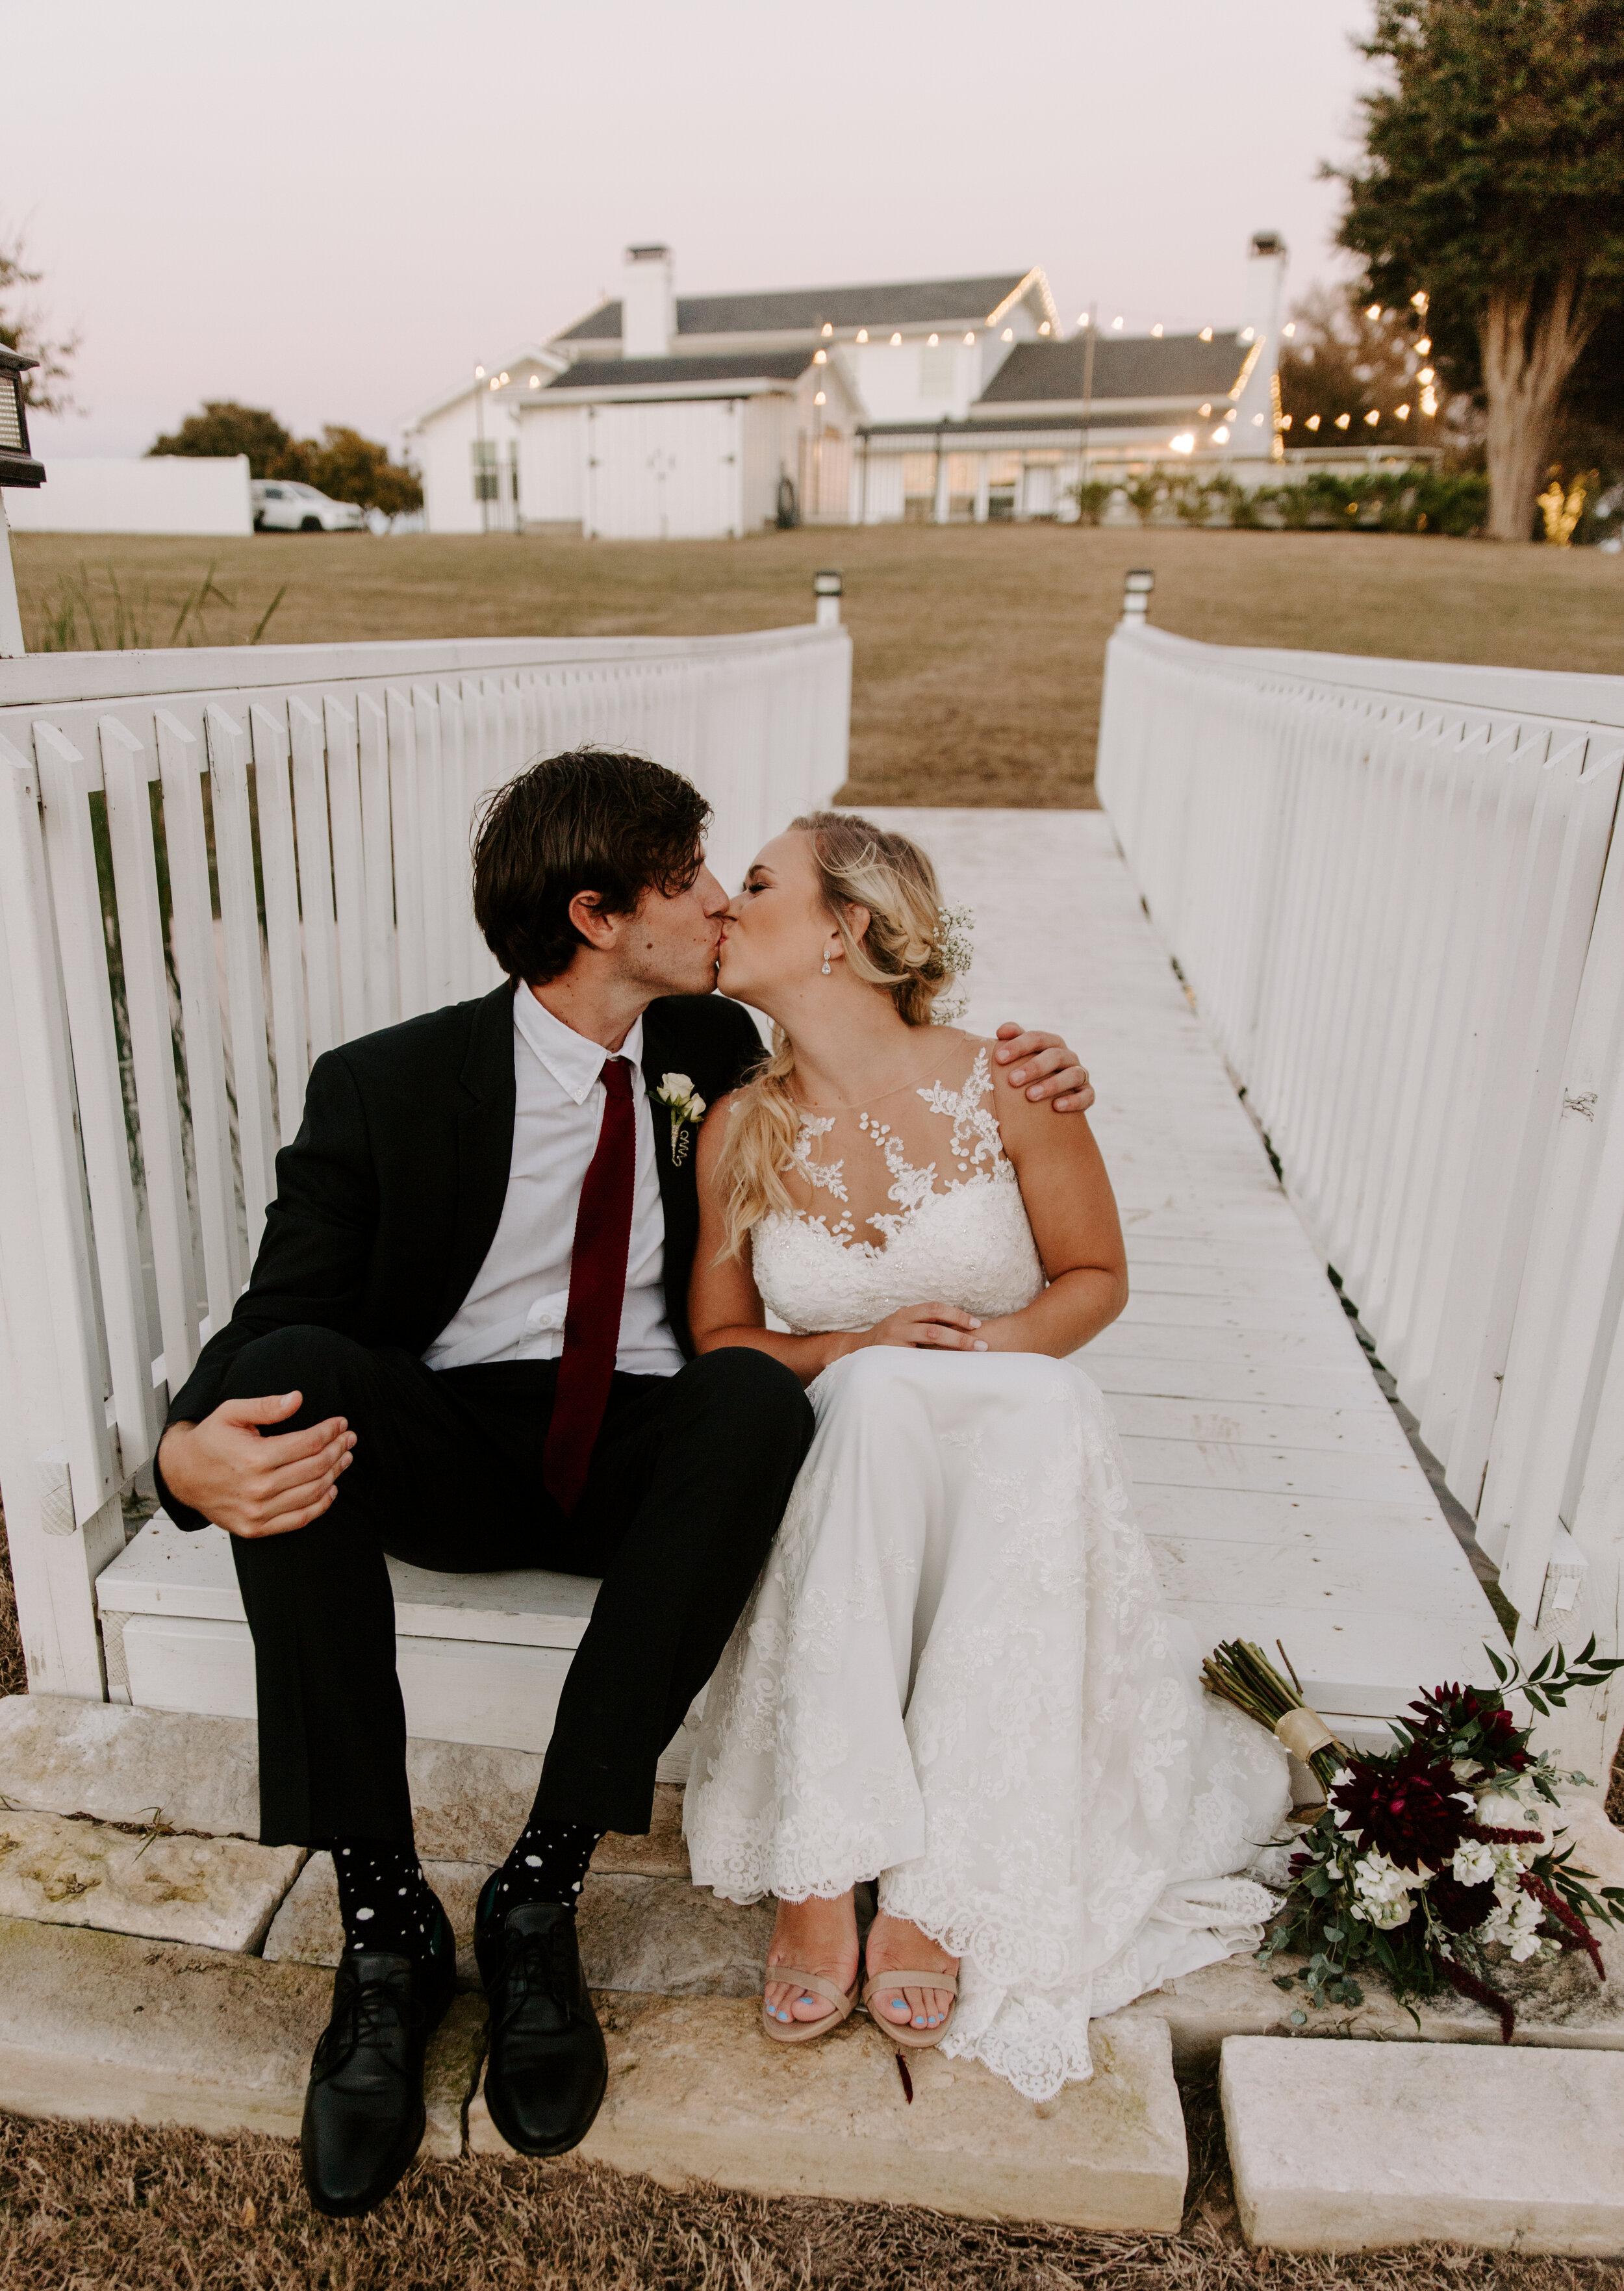 Wedding Bealls - The Beall Wedding - Gabby and Daren - Meme Urbane Photography_-20.jpg